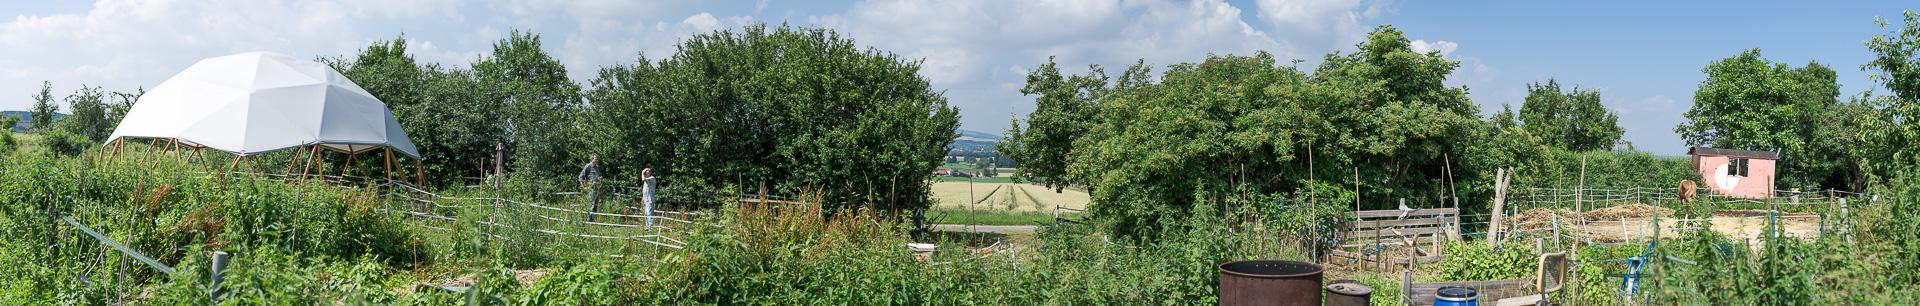 Panorama des Gartens